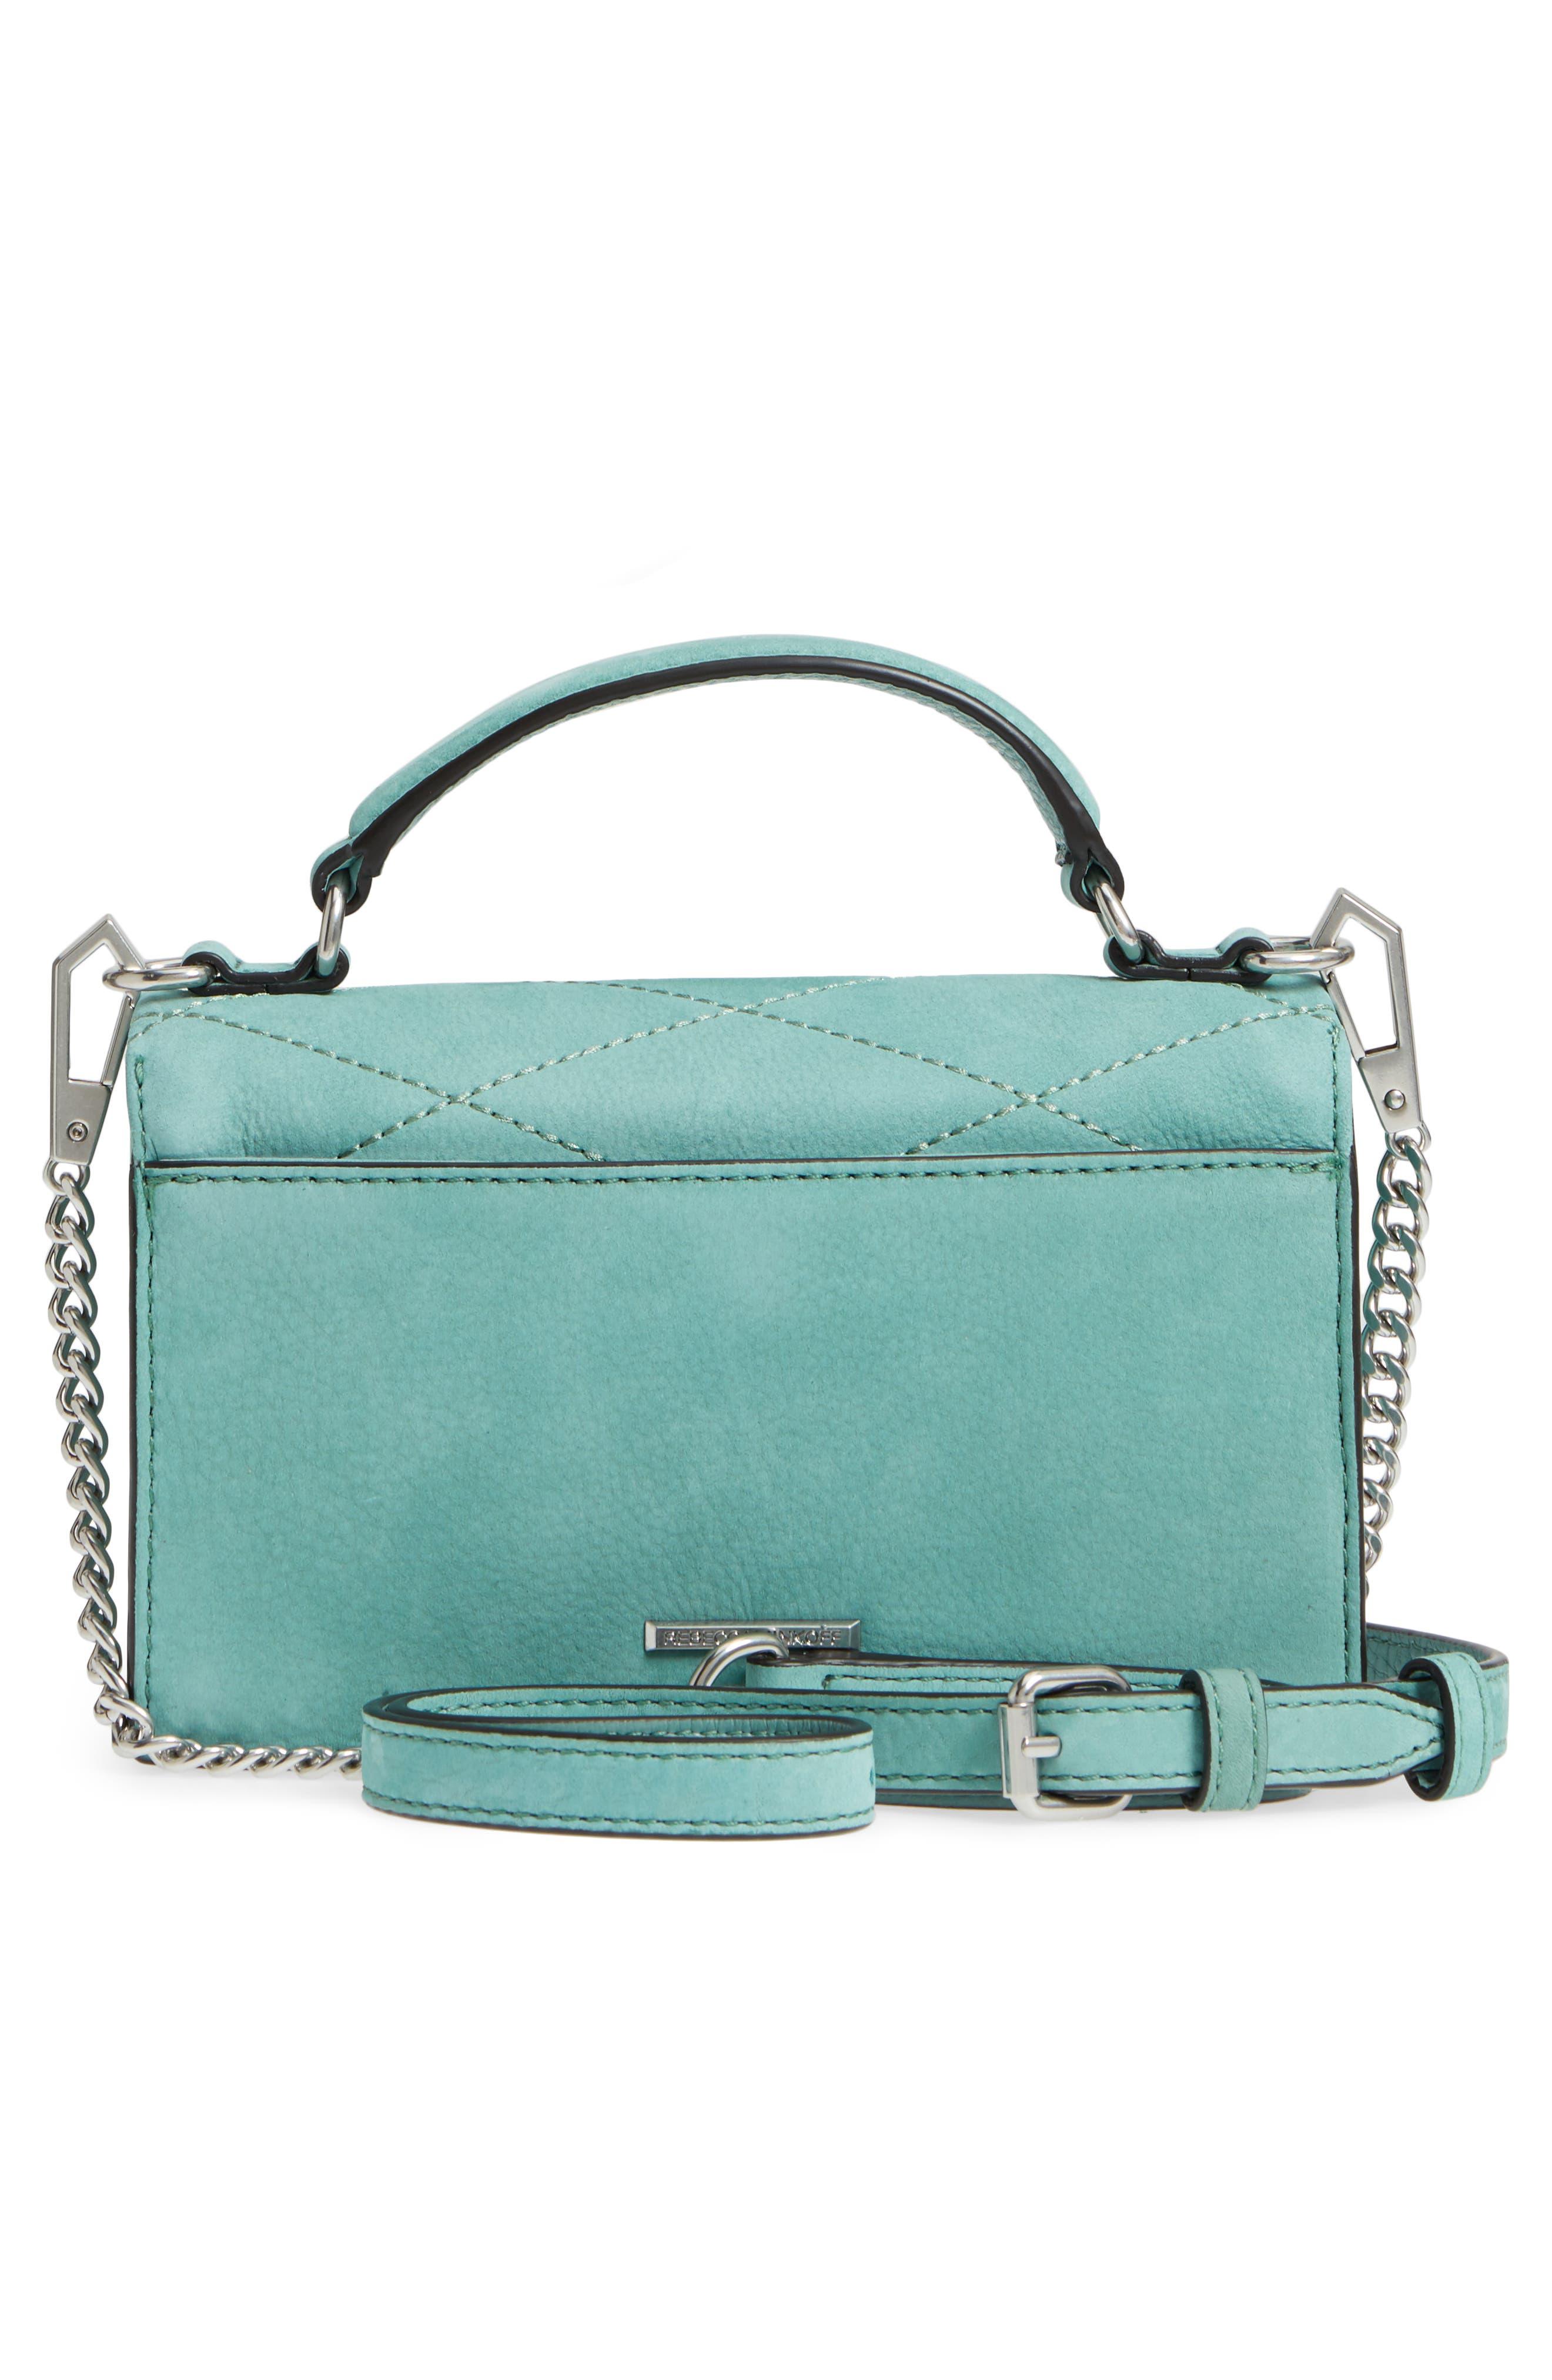 Alternate Image 3  - Rebecca Minkoff Small Je T'aime Leather Crossbody Bag